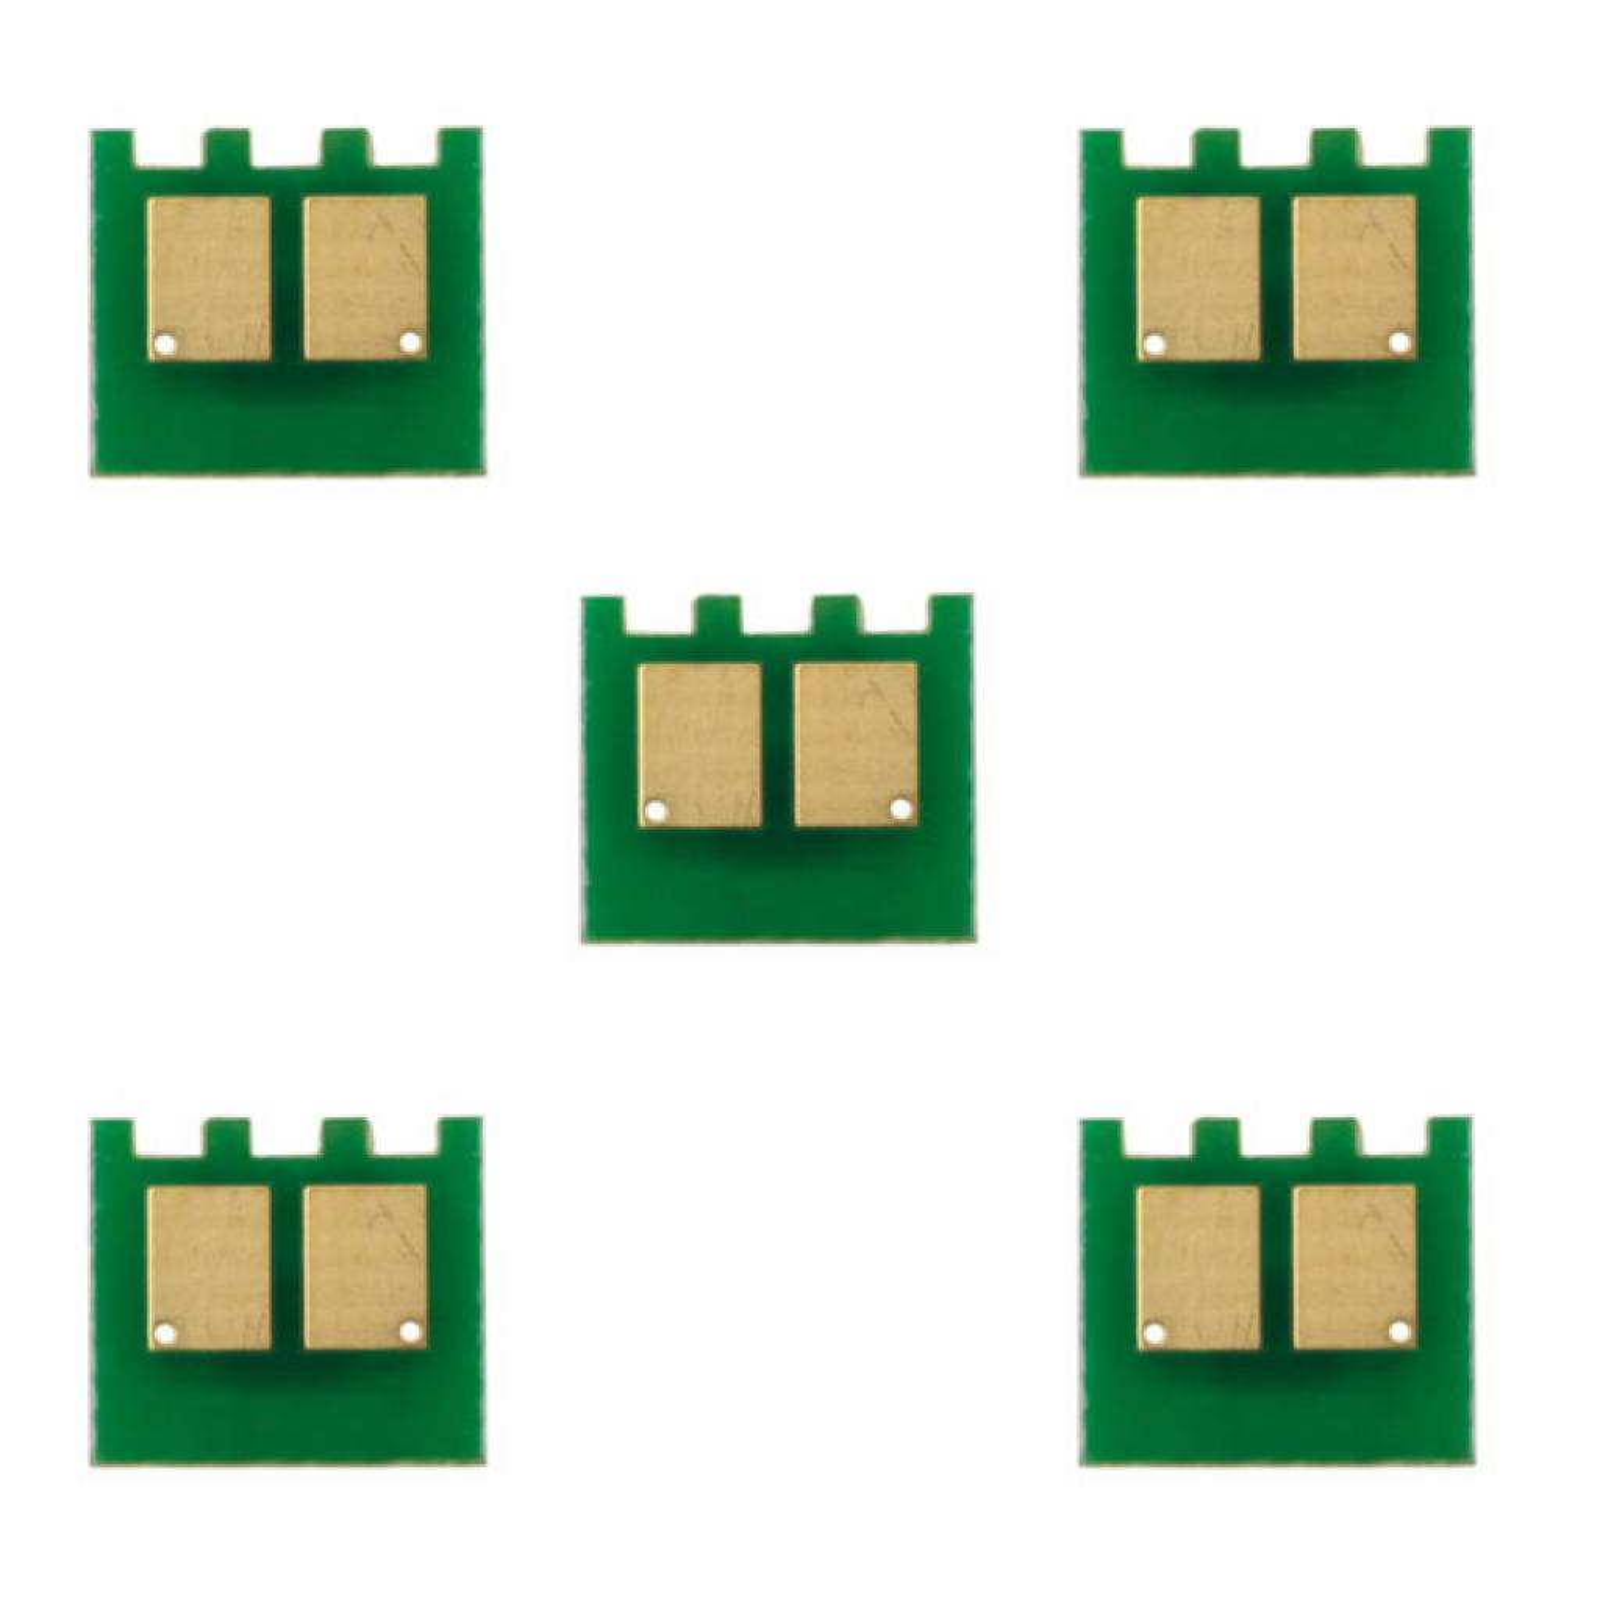 Чип для картриджа HP CLJ Pro M476 (MPS) (CF381A) 3.5k cyan Static Control (XTH476CP-C)